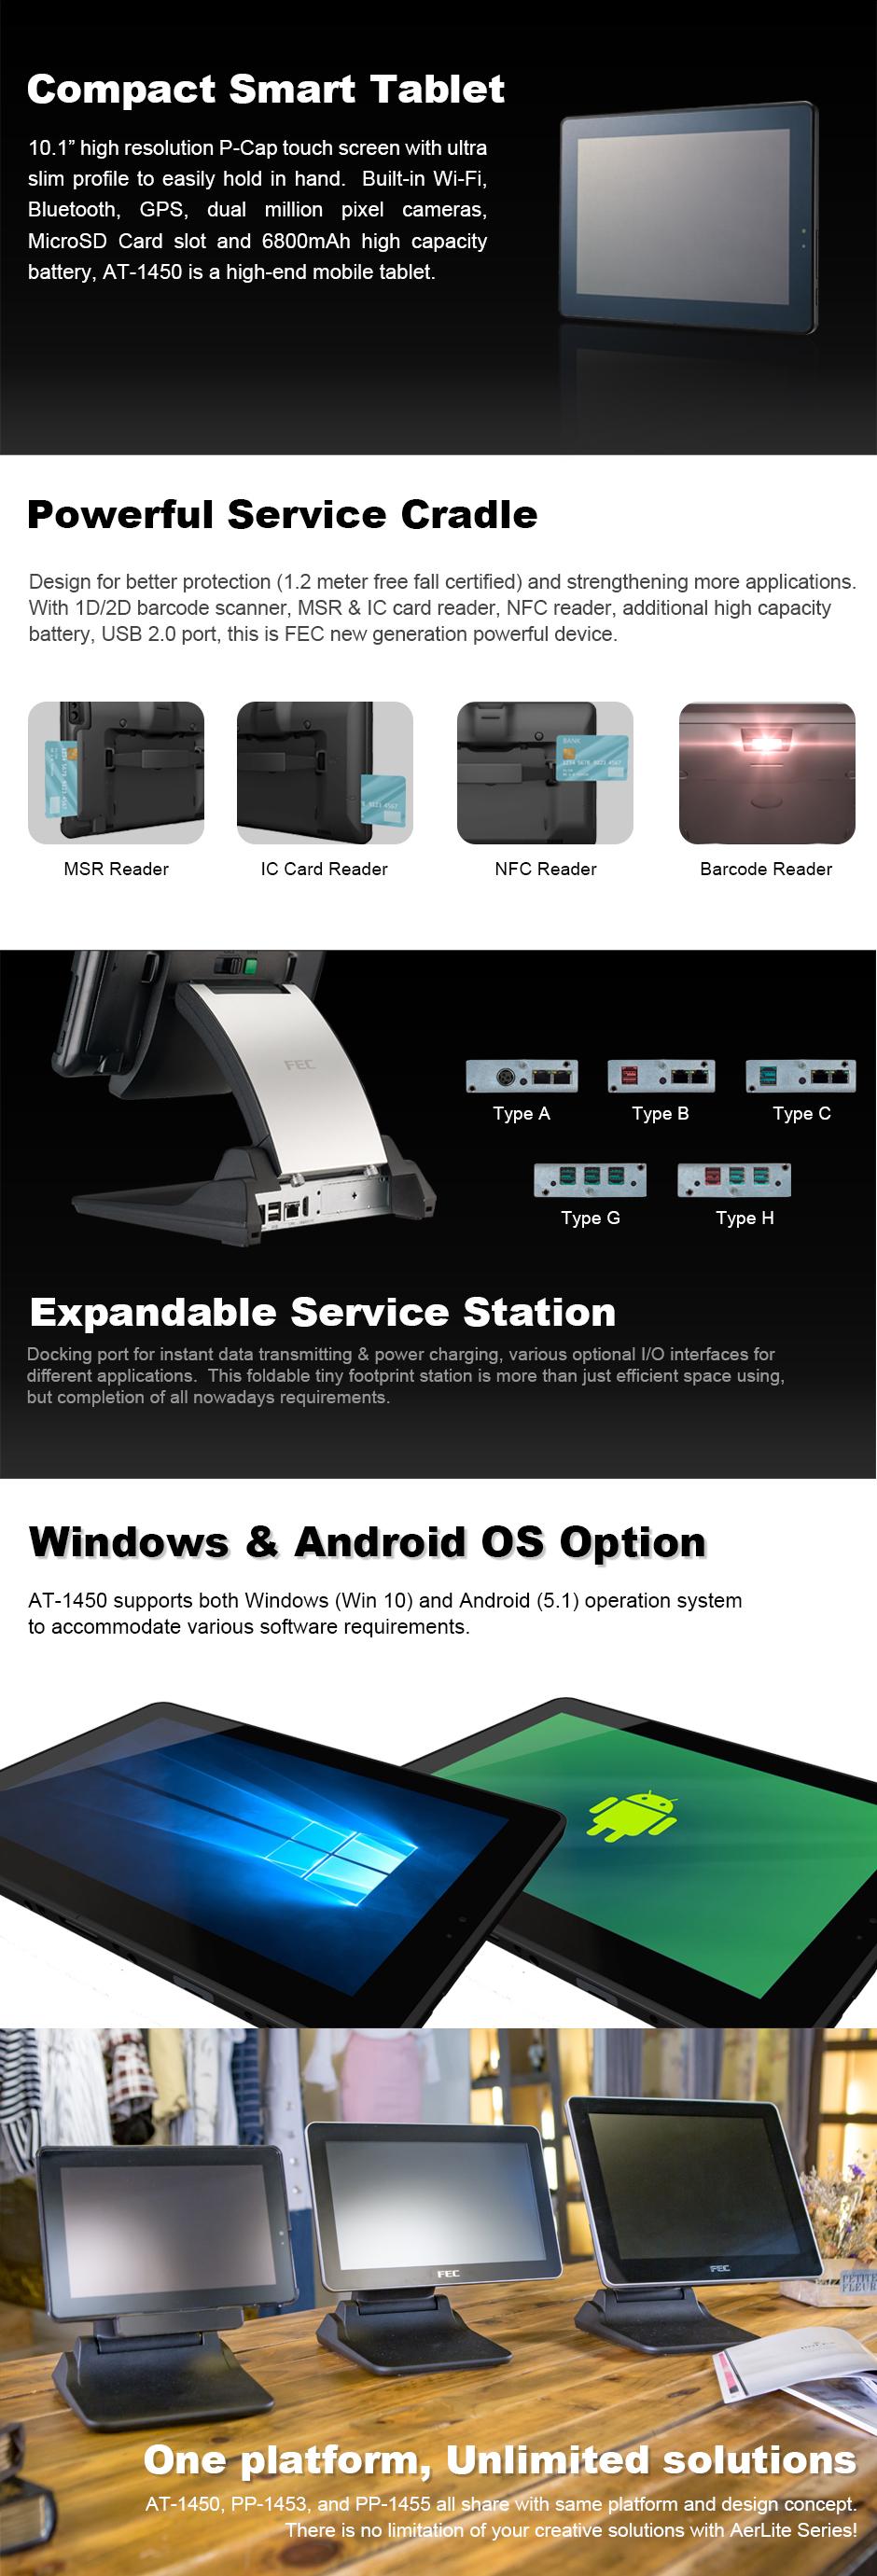 vivipos, pos, wp2, posworks, FEC, kiosk, self-service kiosk, point